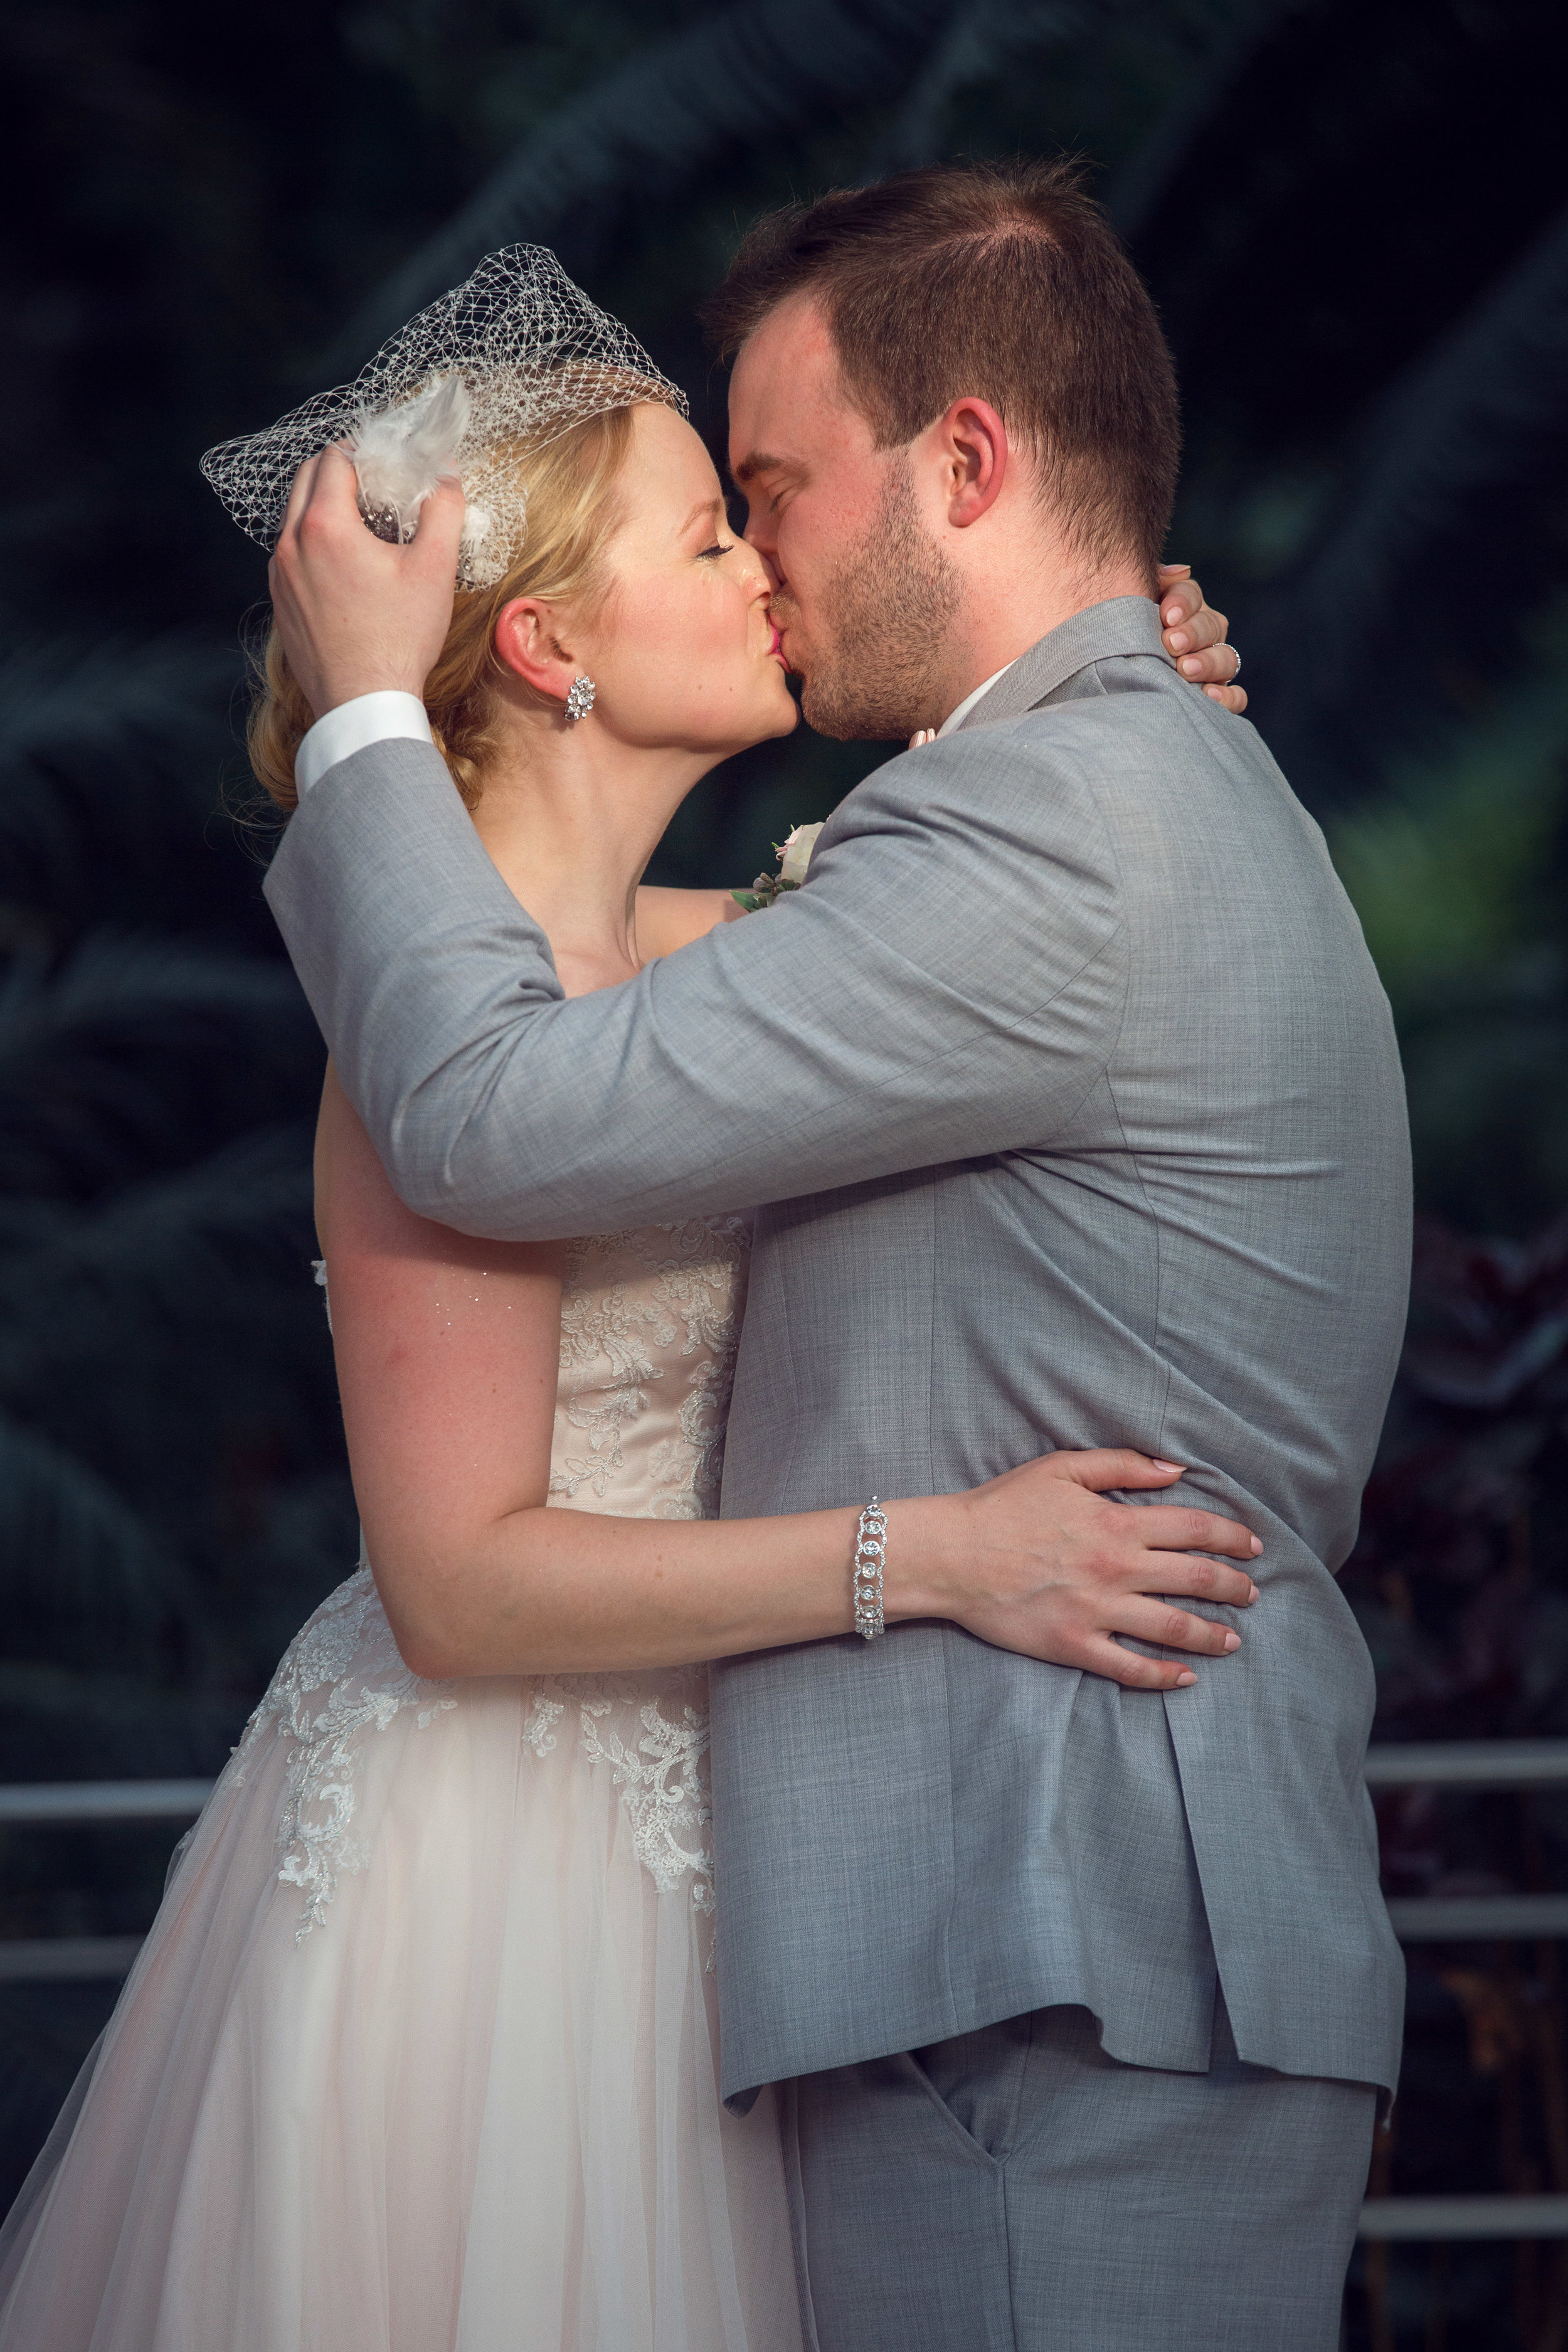 cincinnati wedding 8 (1 of 1).jpg